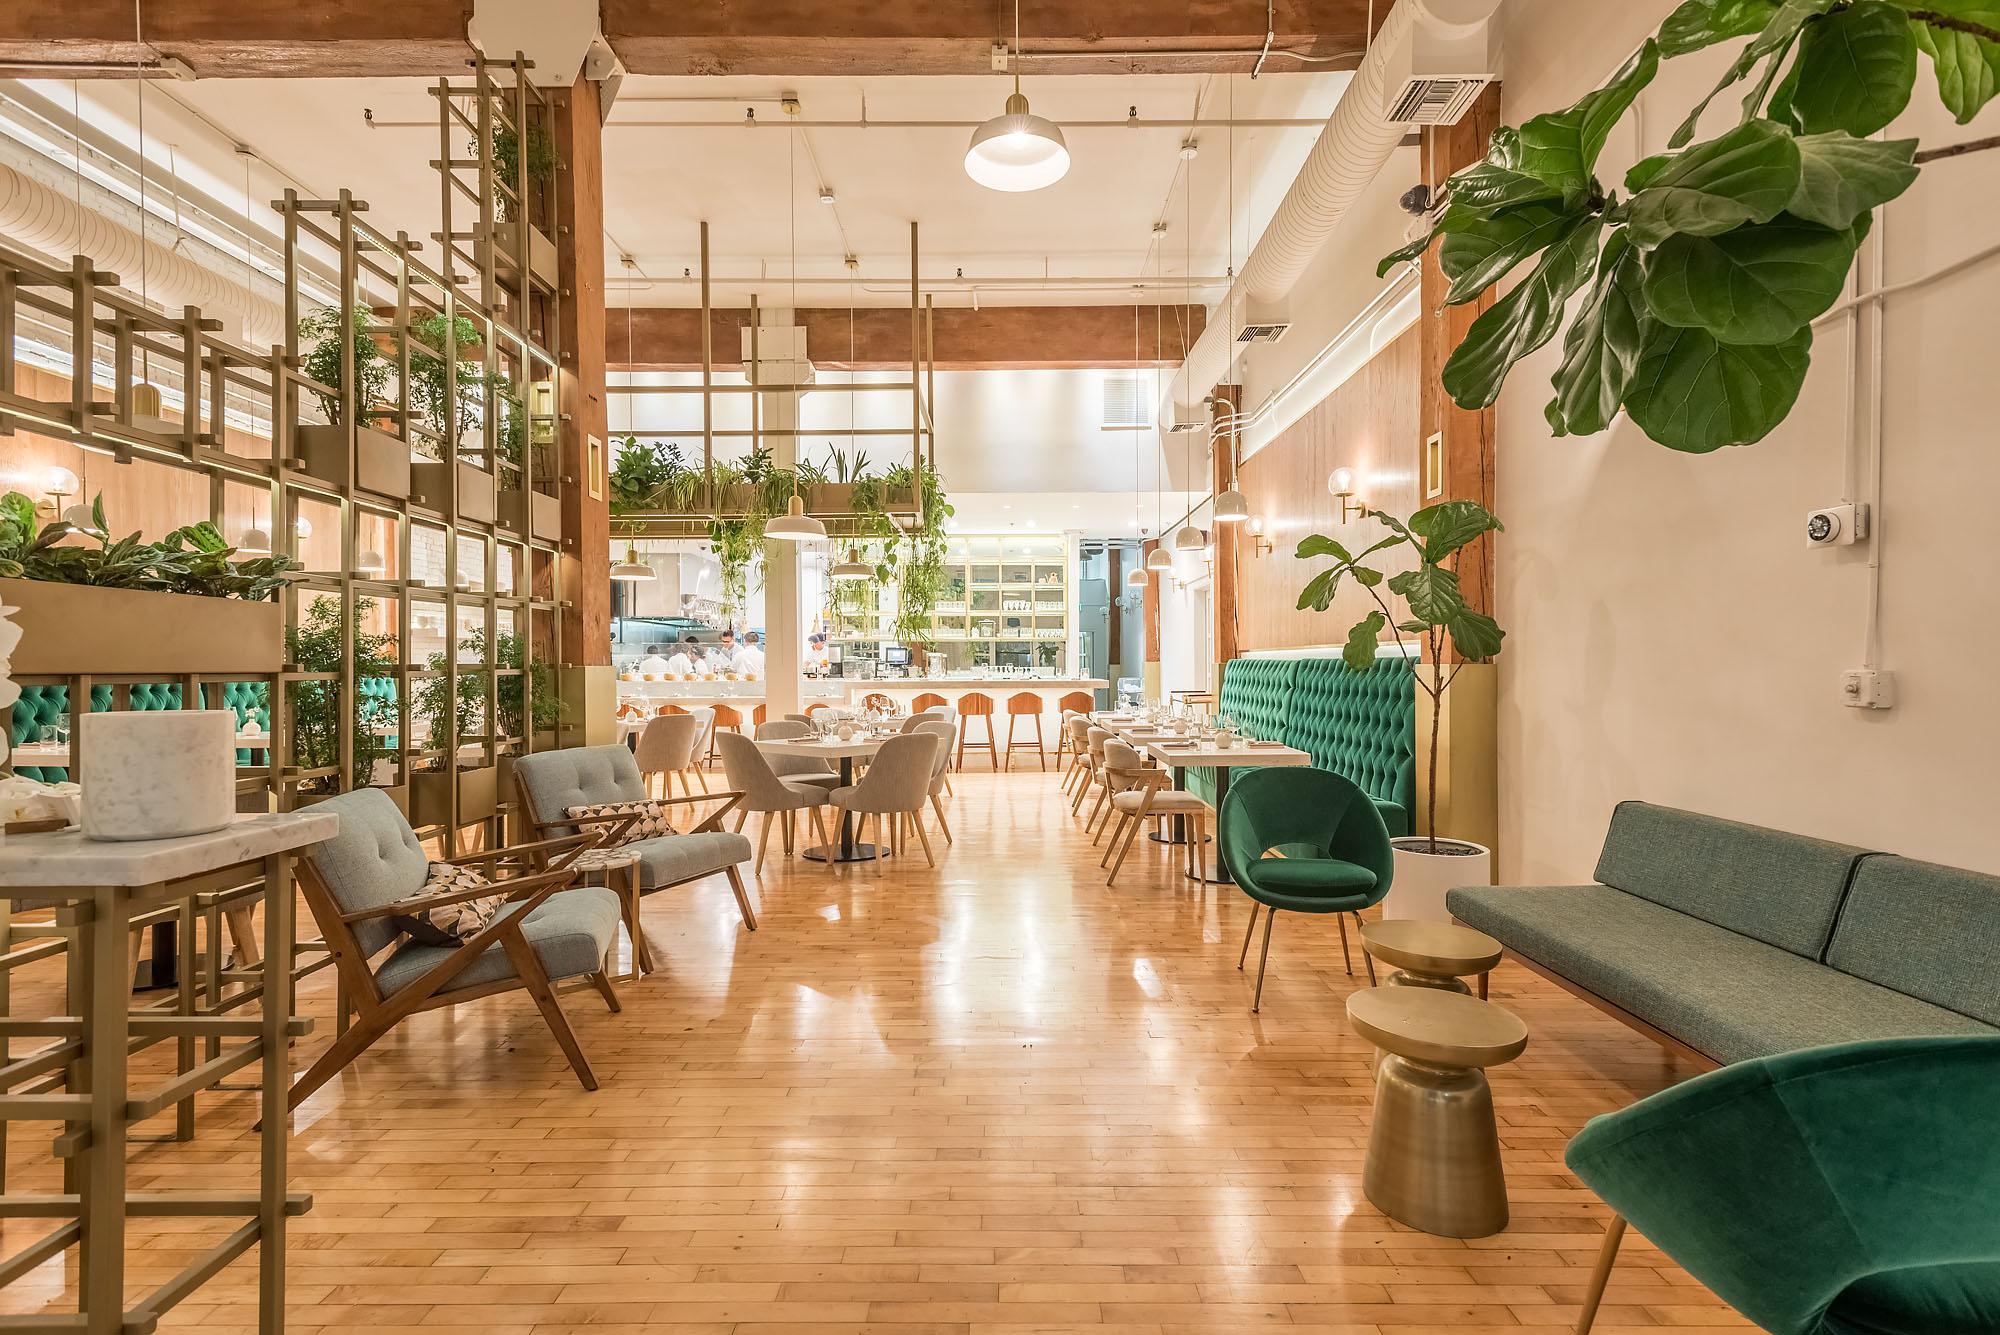 LA Times Declares Nightshade One of LA's 'Most Interesting' Restaurants